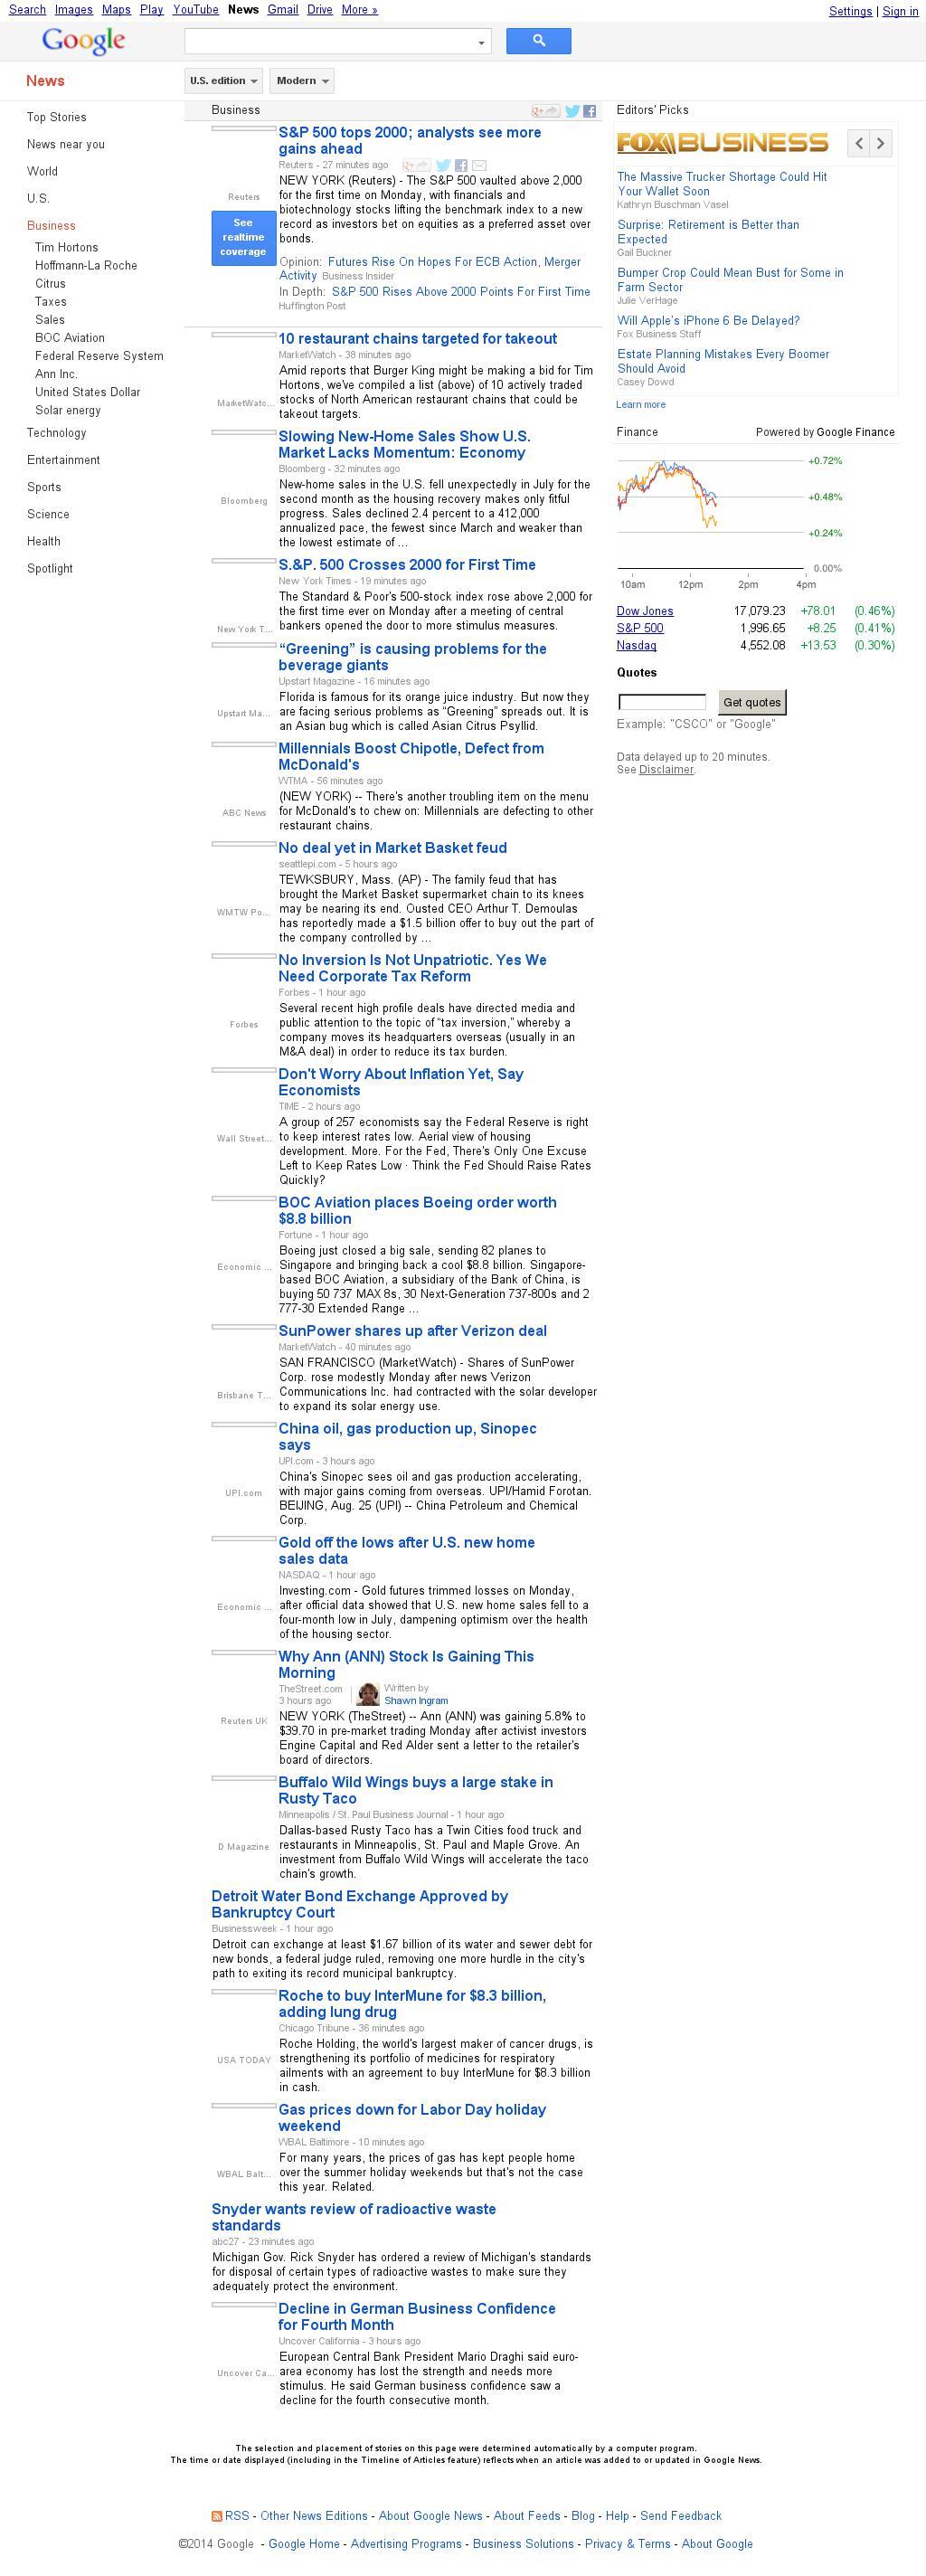 Google News: Business at Monday Aug. 25, 2014, 5:09 p.m. UTC